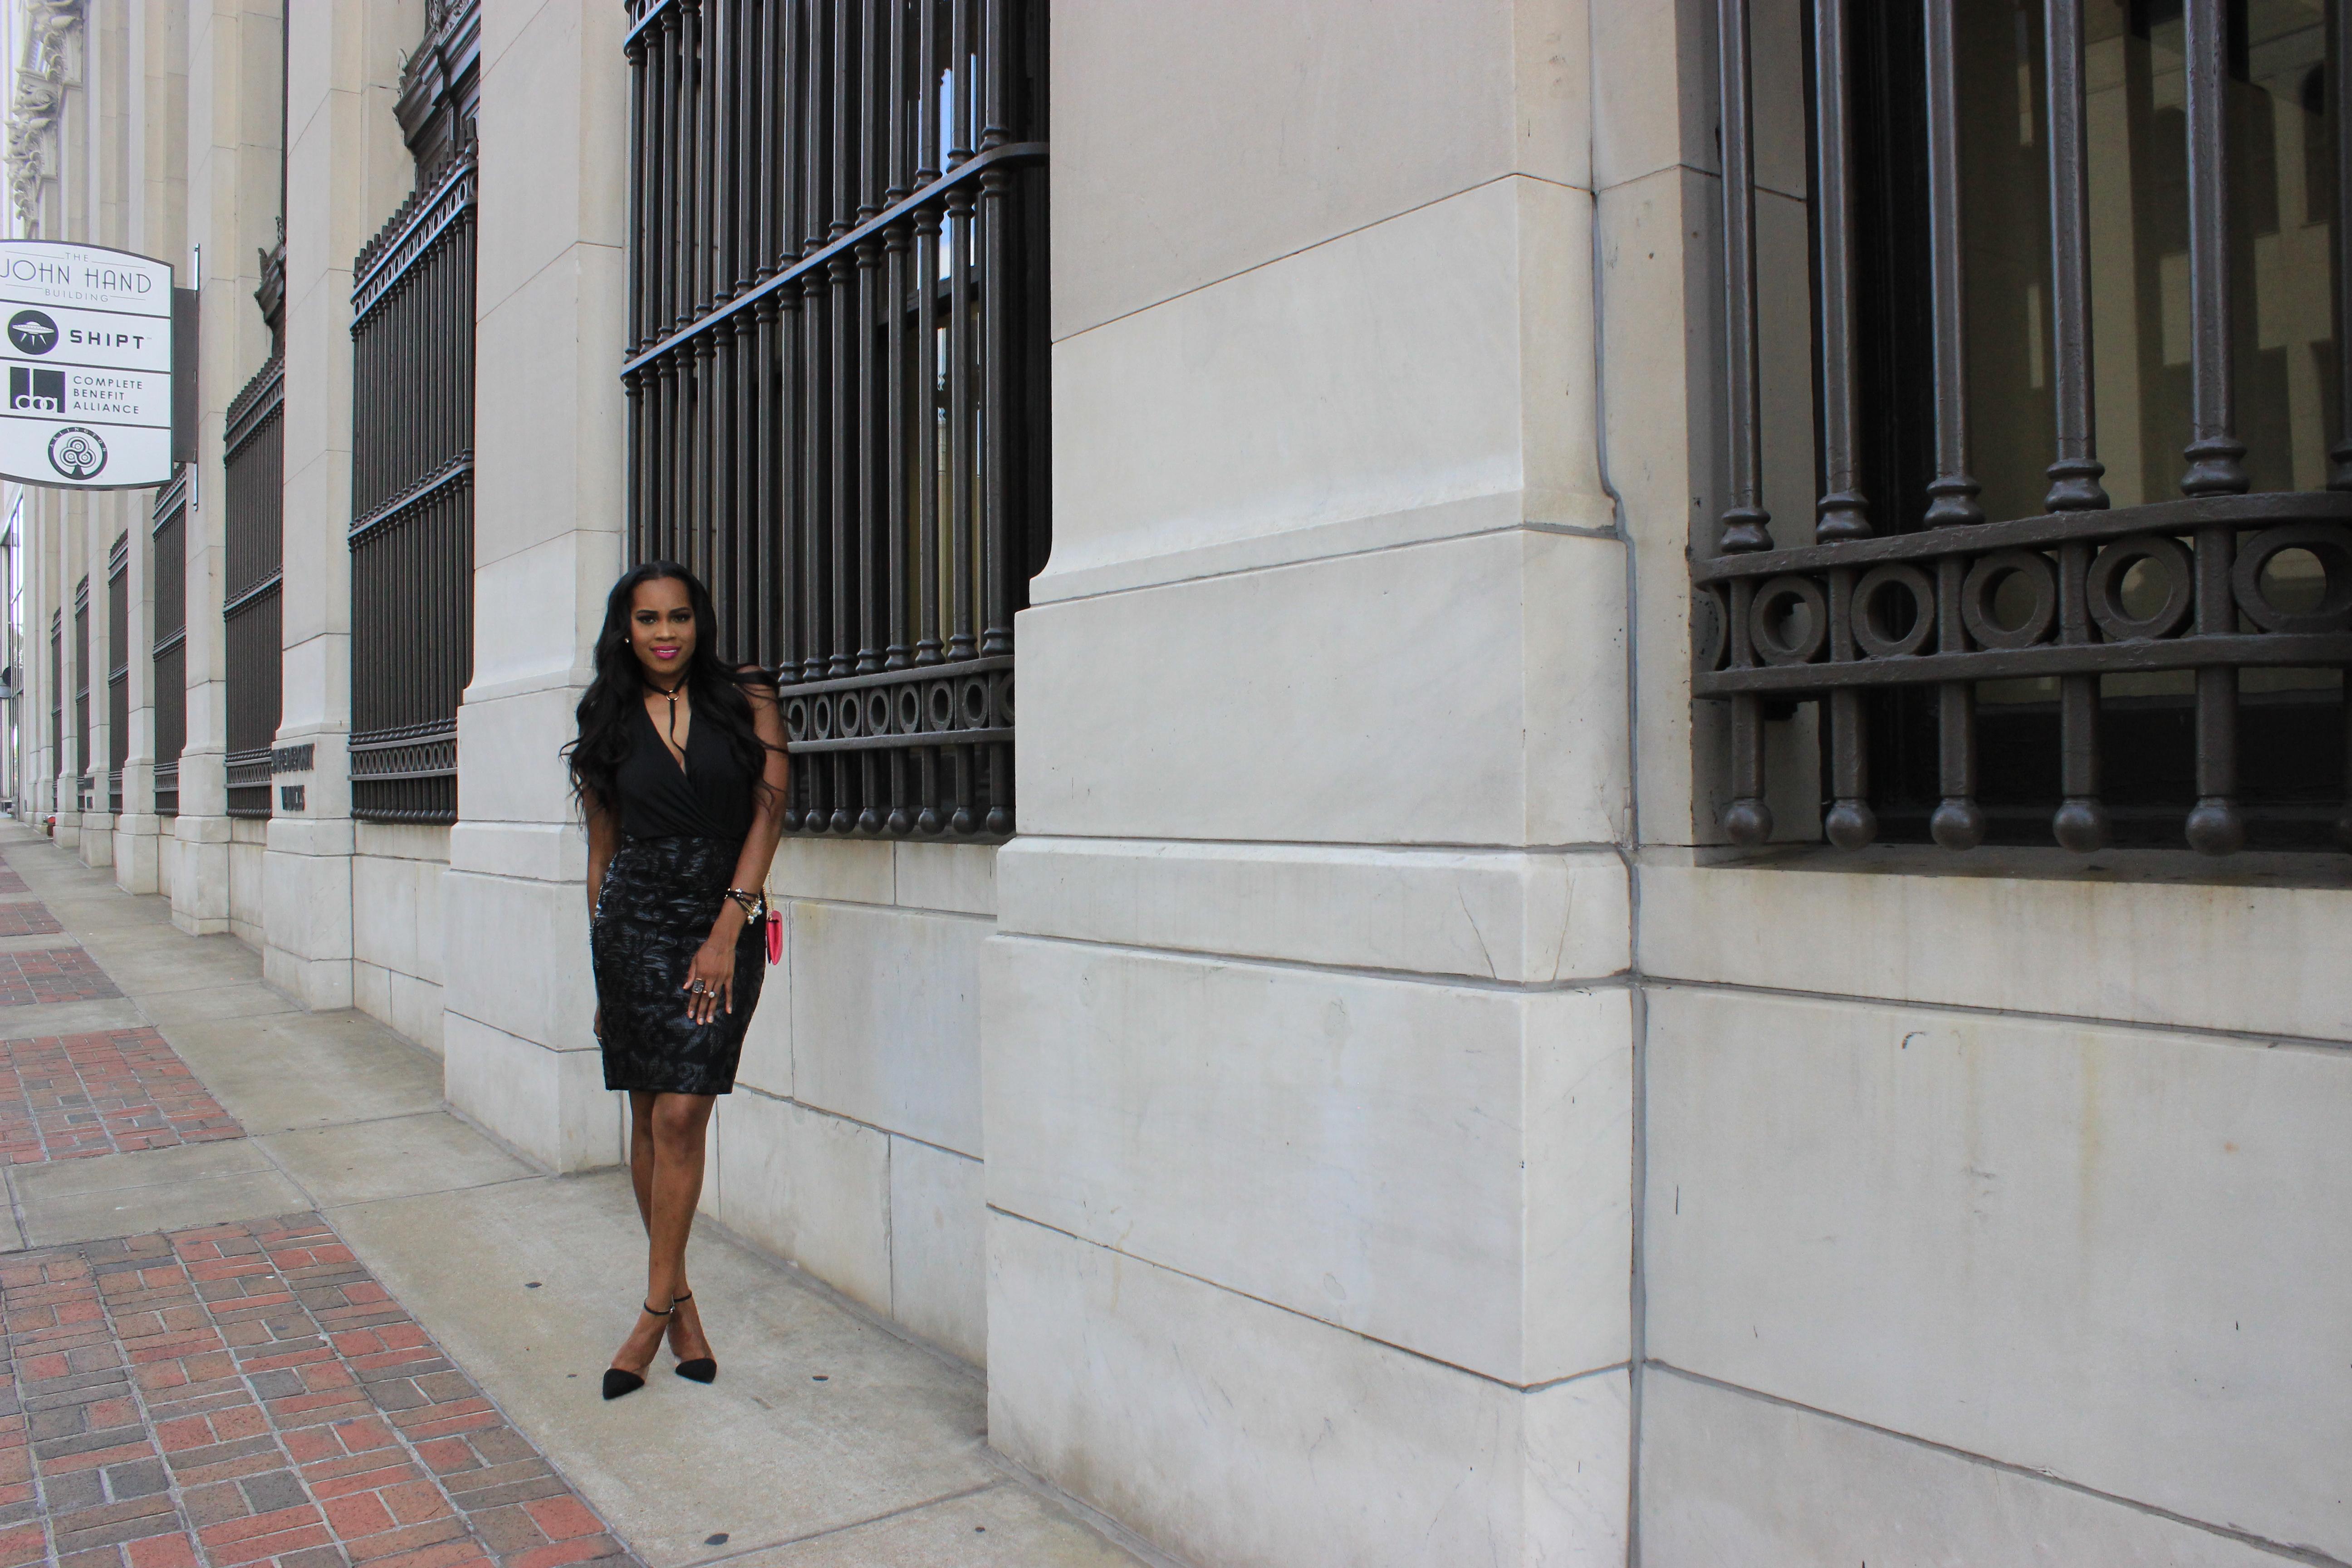 Style-Files-Forever-21-black-lace-pencil-skirt-victoria-secret-black-vneck-bodysuit-all-black-fashion-look-Zara-vinyl-d-orsay-pumps-oohlalablog-14